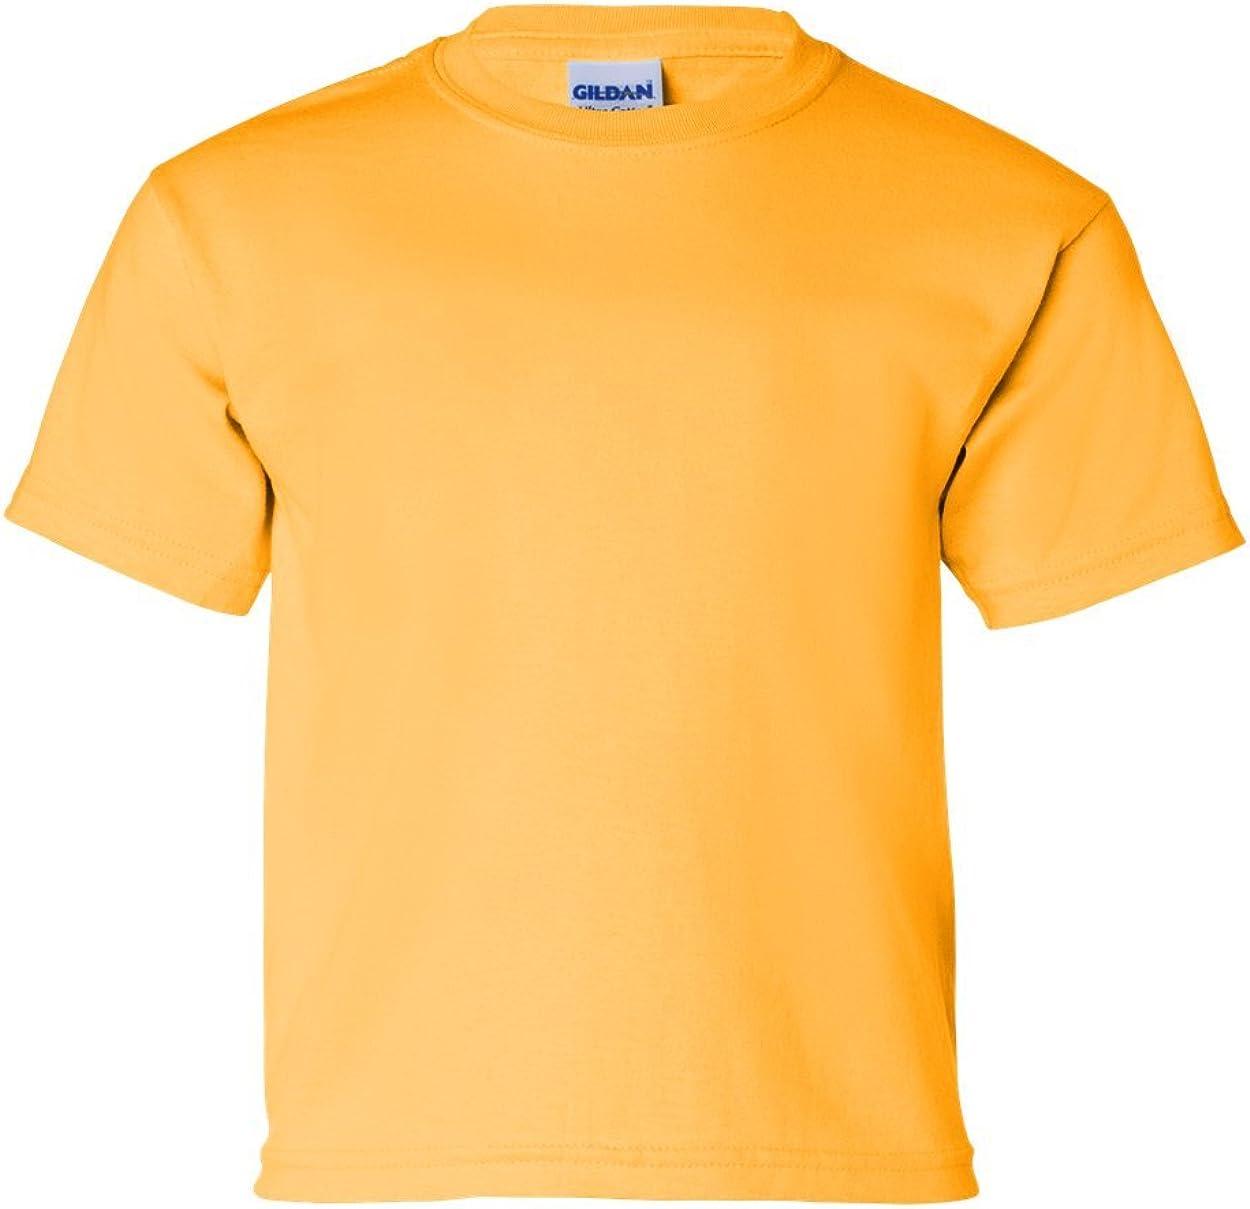 Cotton T-Shirt (G200B) Gold, M (Pack of 12)